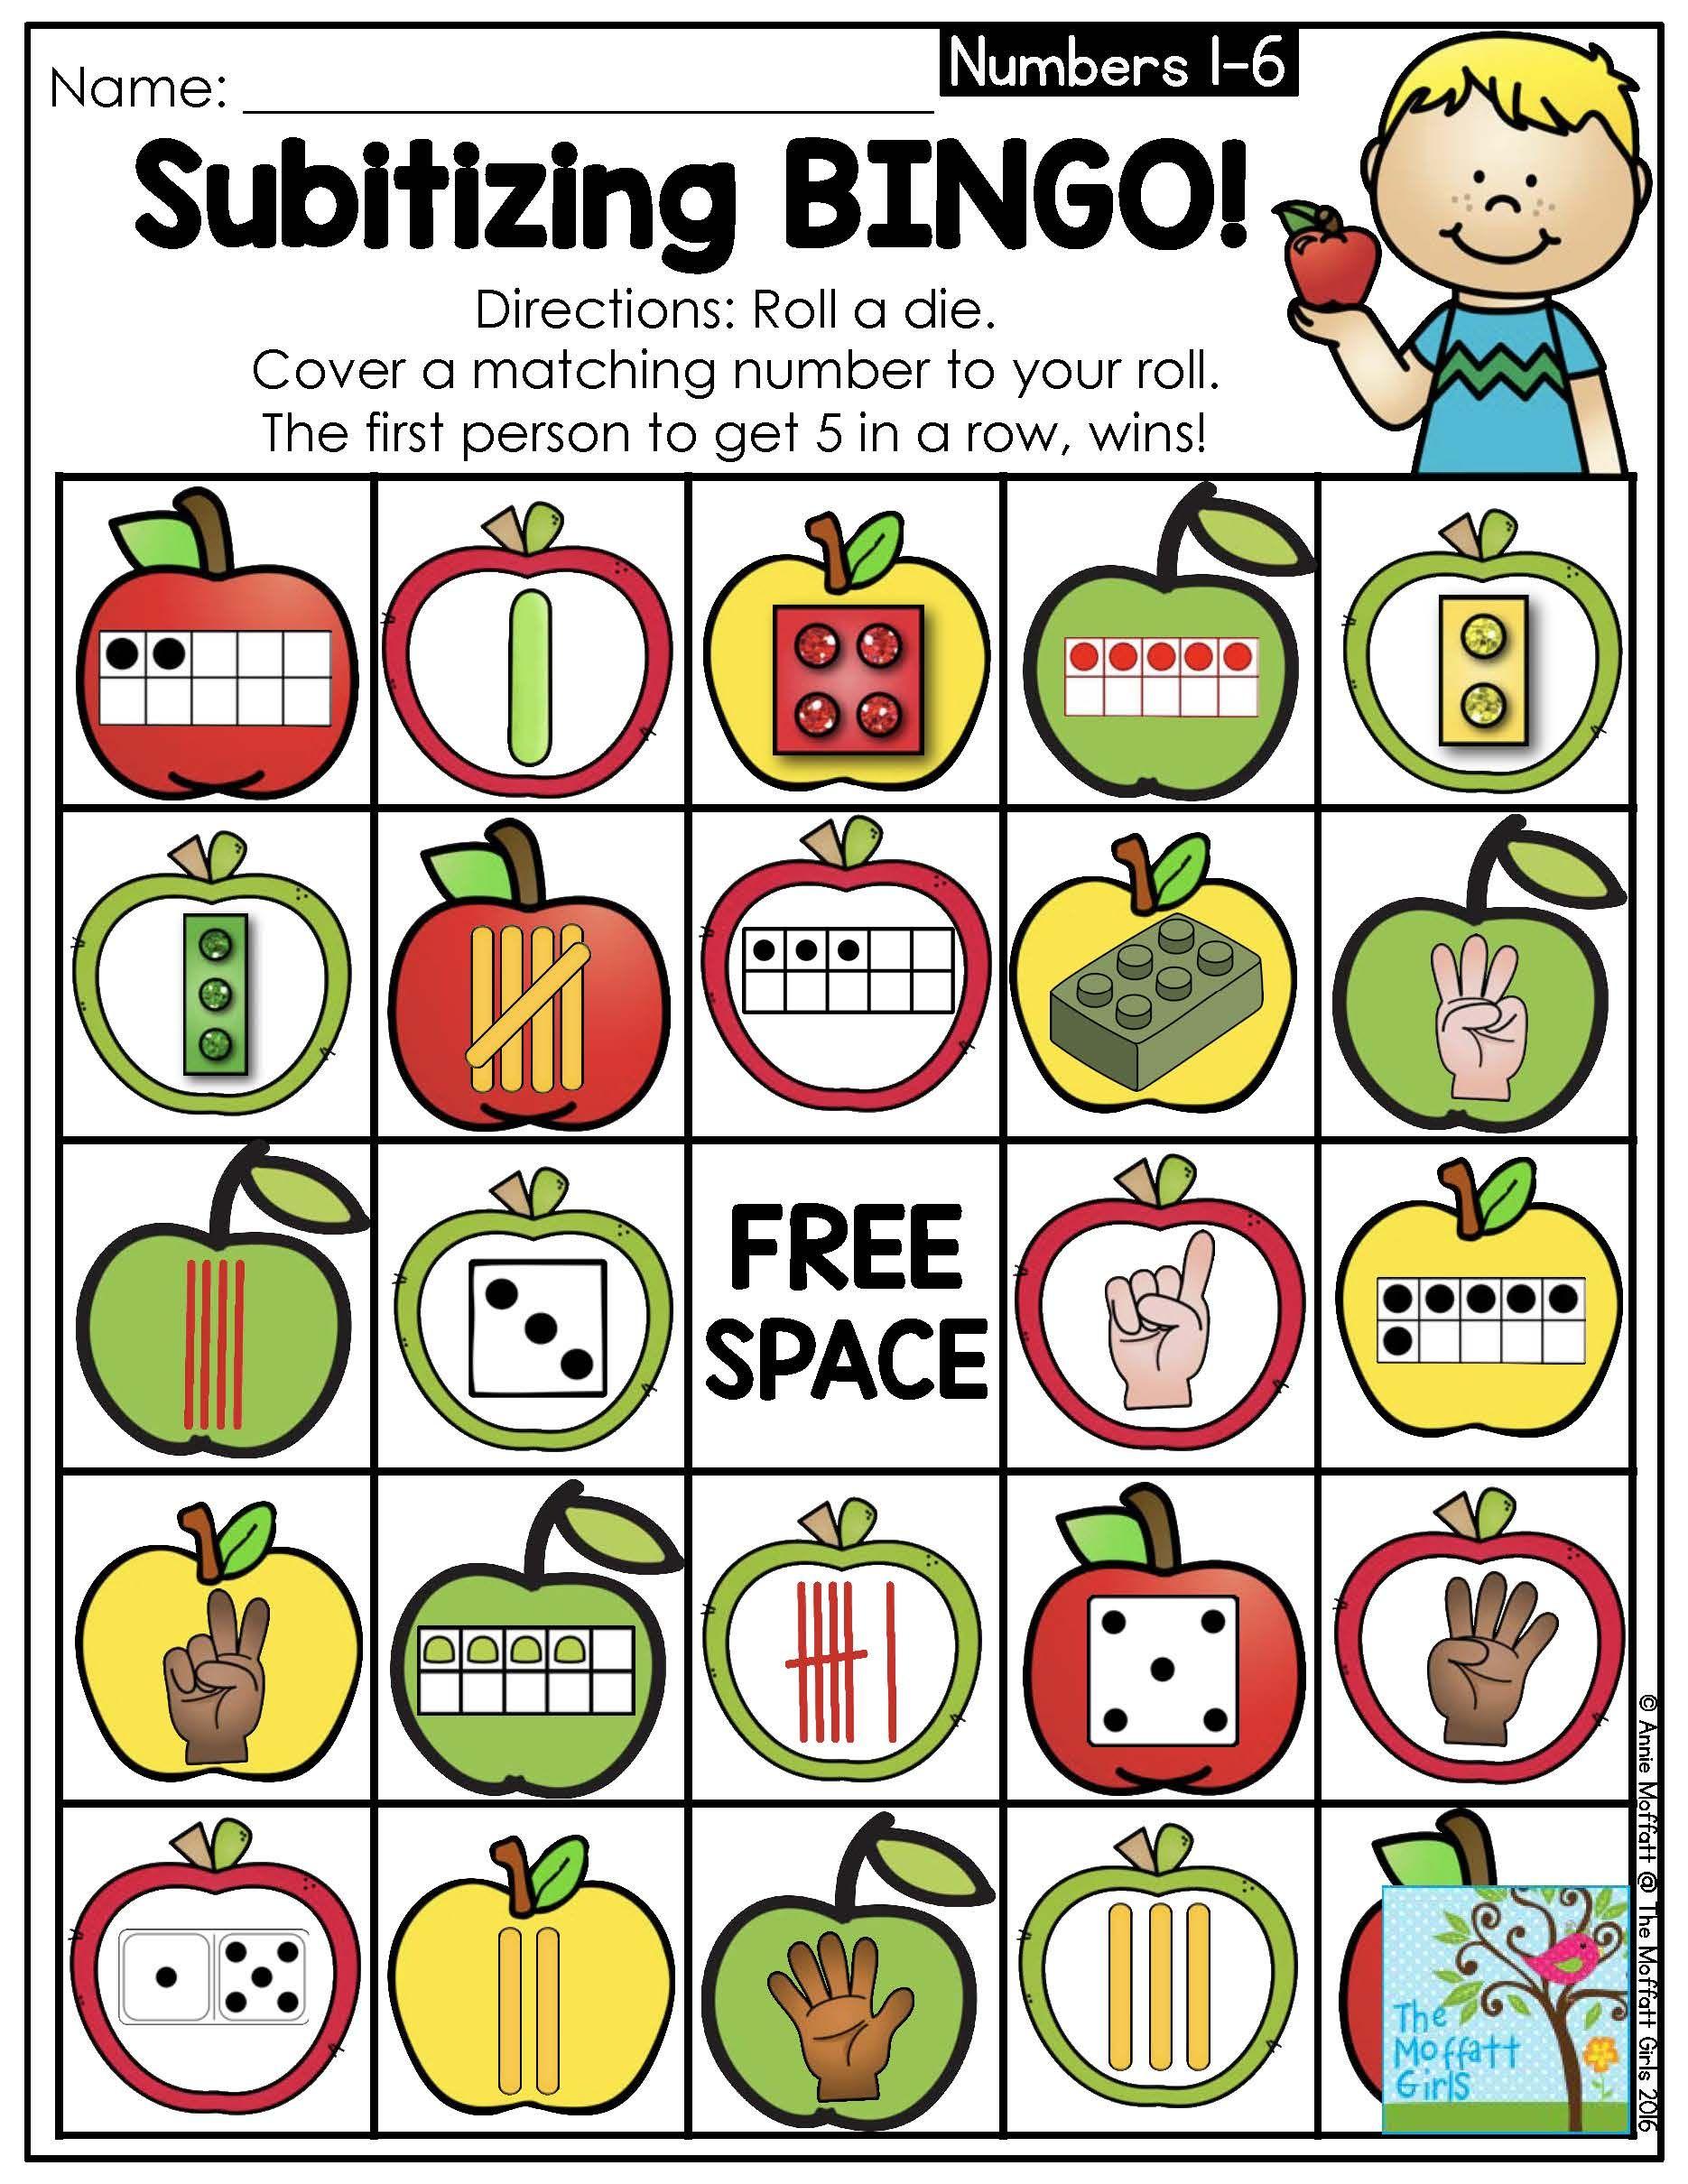 What Is Subitizing And Why Teach It Kindergarten Math Kindergarten Math Activities Preschool Math Introducing addition in kindergarten